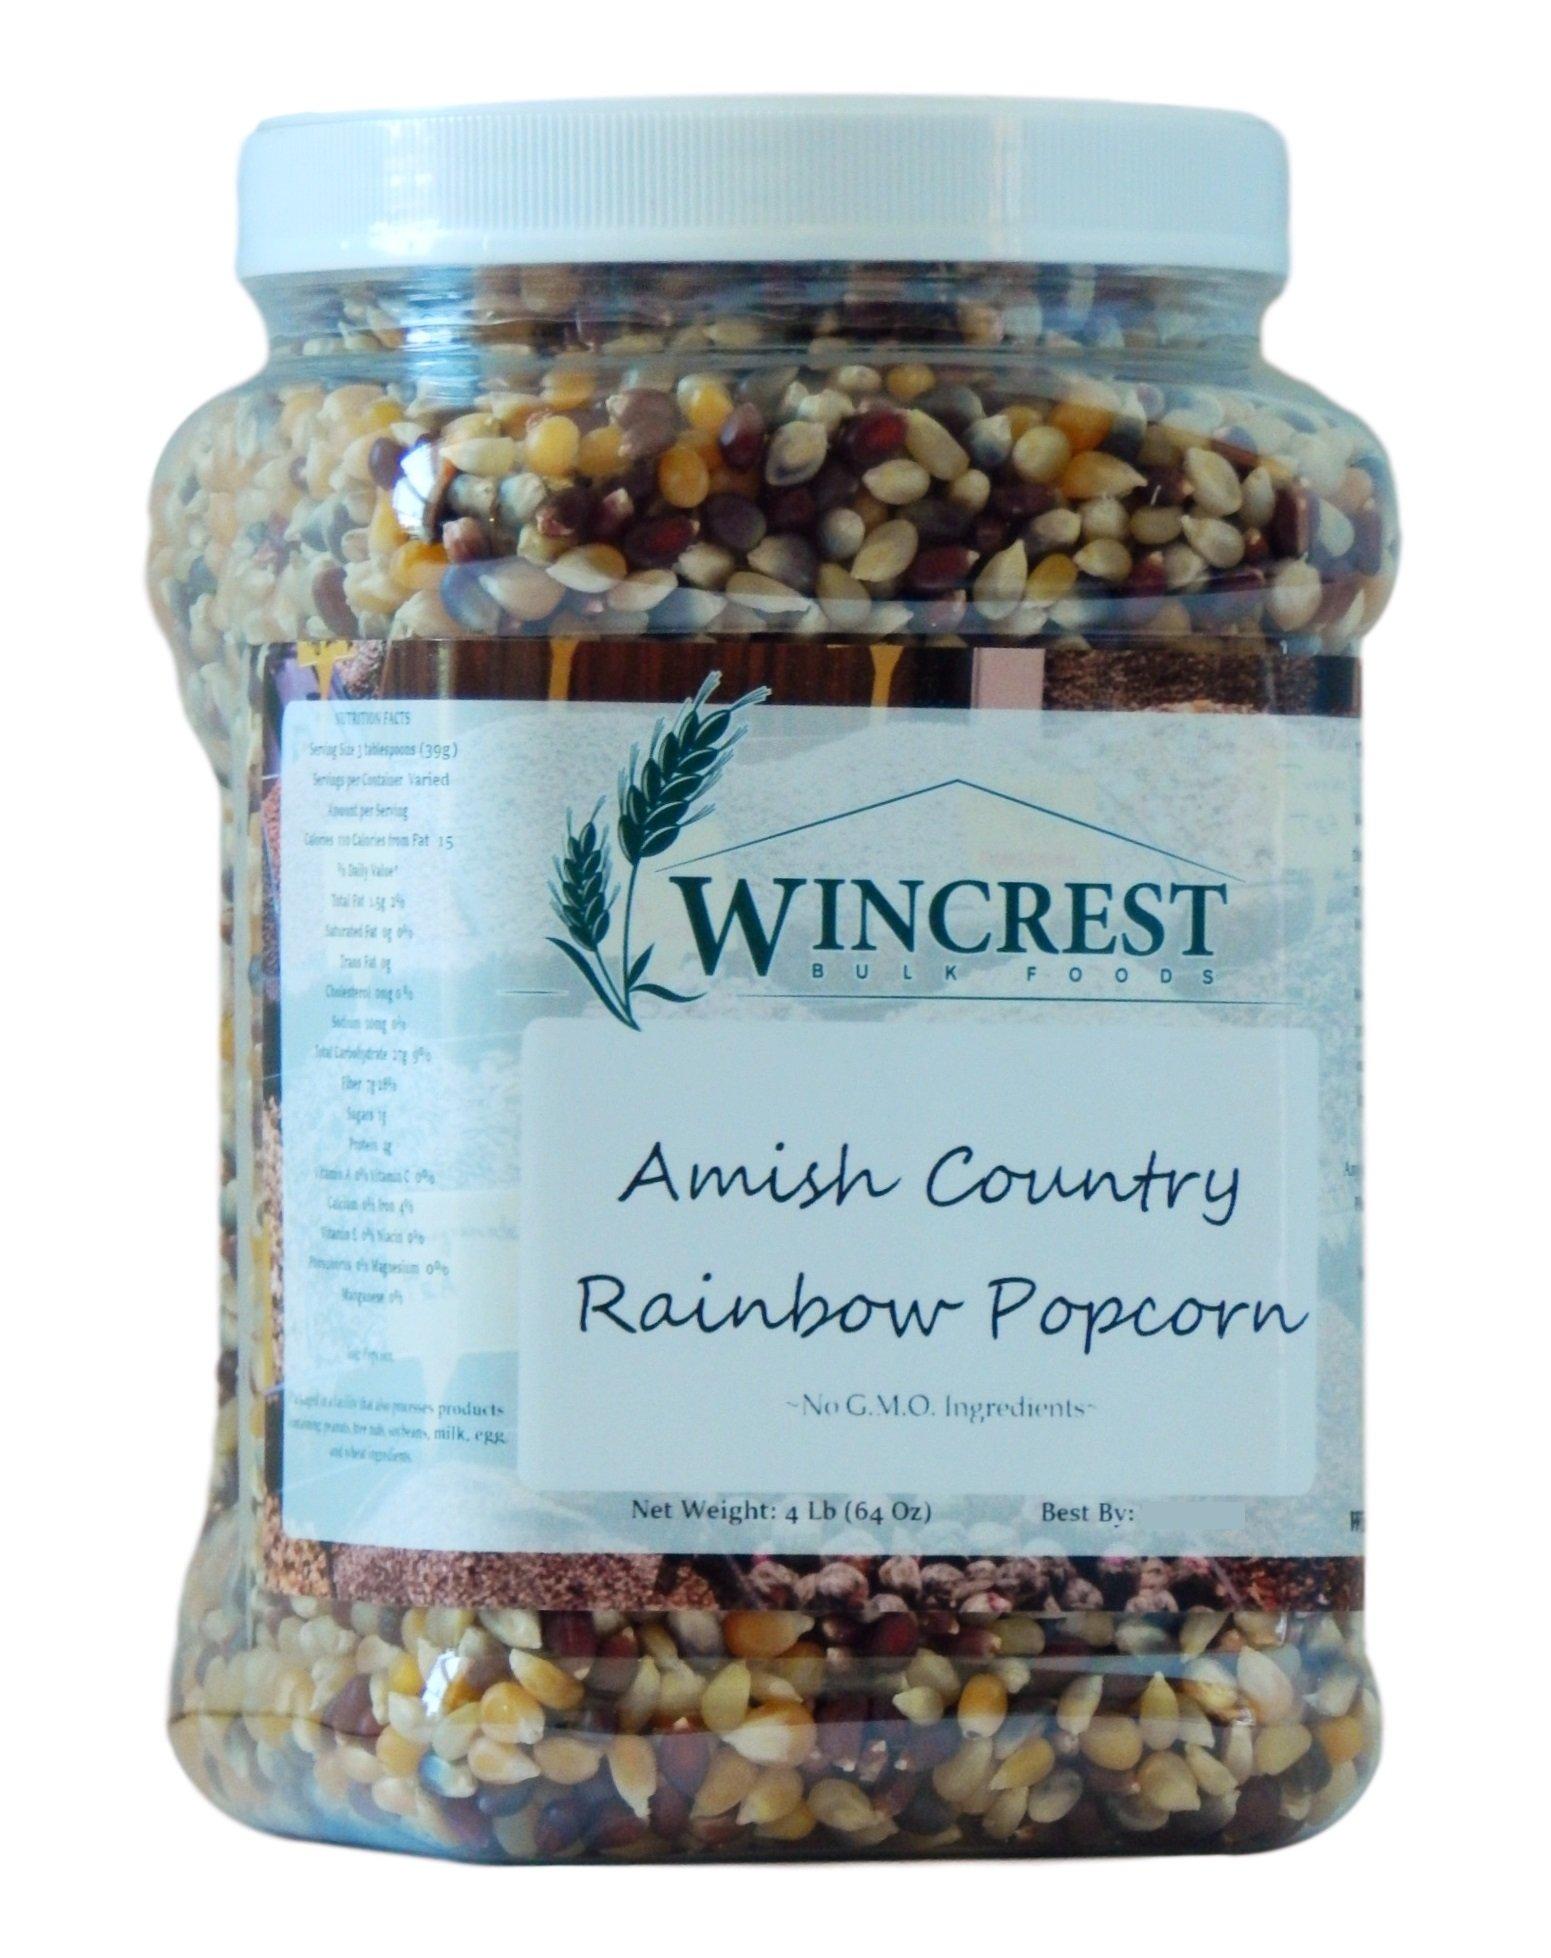 Rainbow Popcorn - 4 Lb Tub (Non GMO) by WinCrest BulkFoods